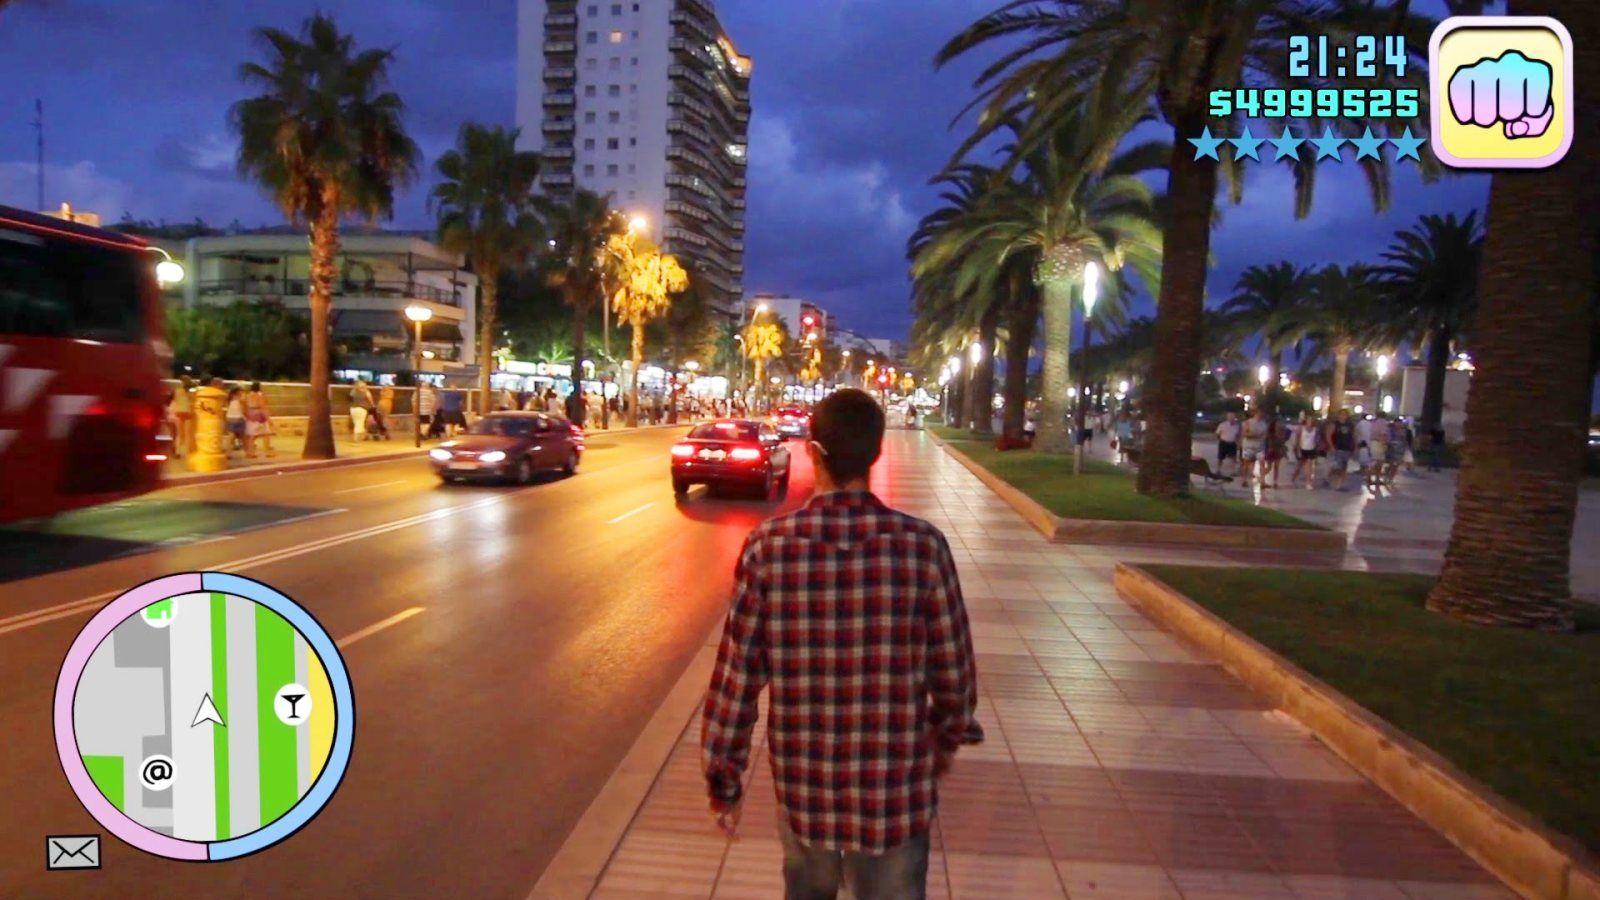 GTA 6: Vice City? | Gaming News | Gta 5 online, Gta online, Gta cars